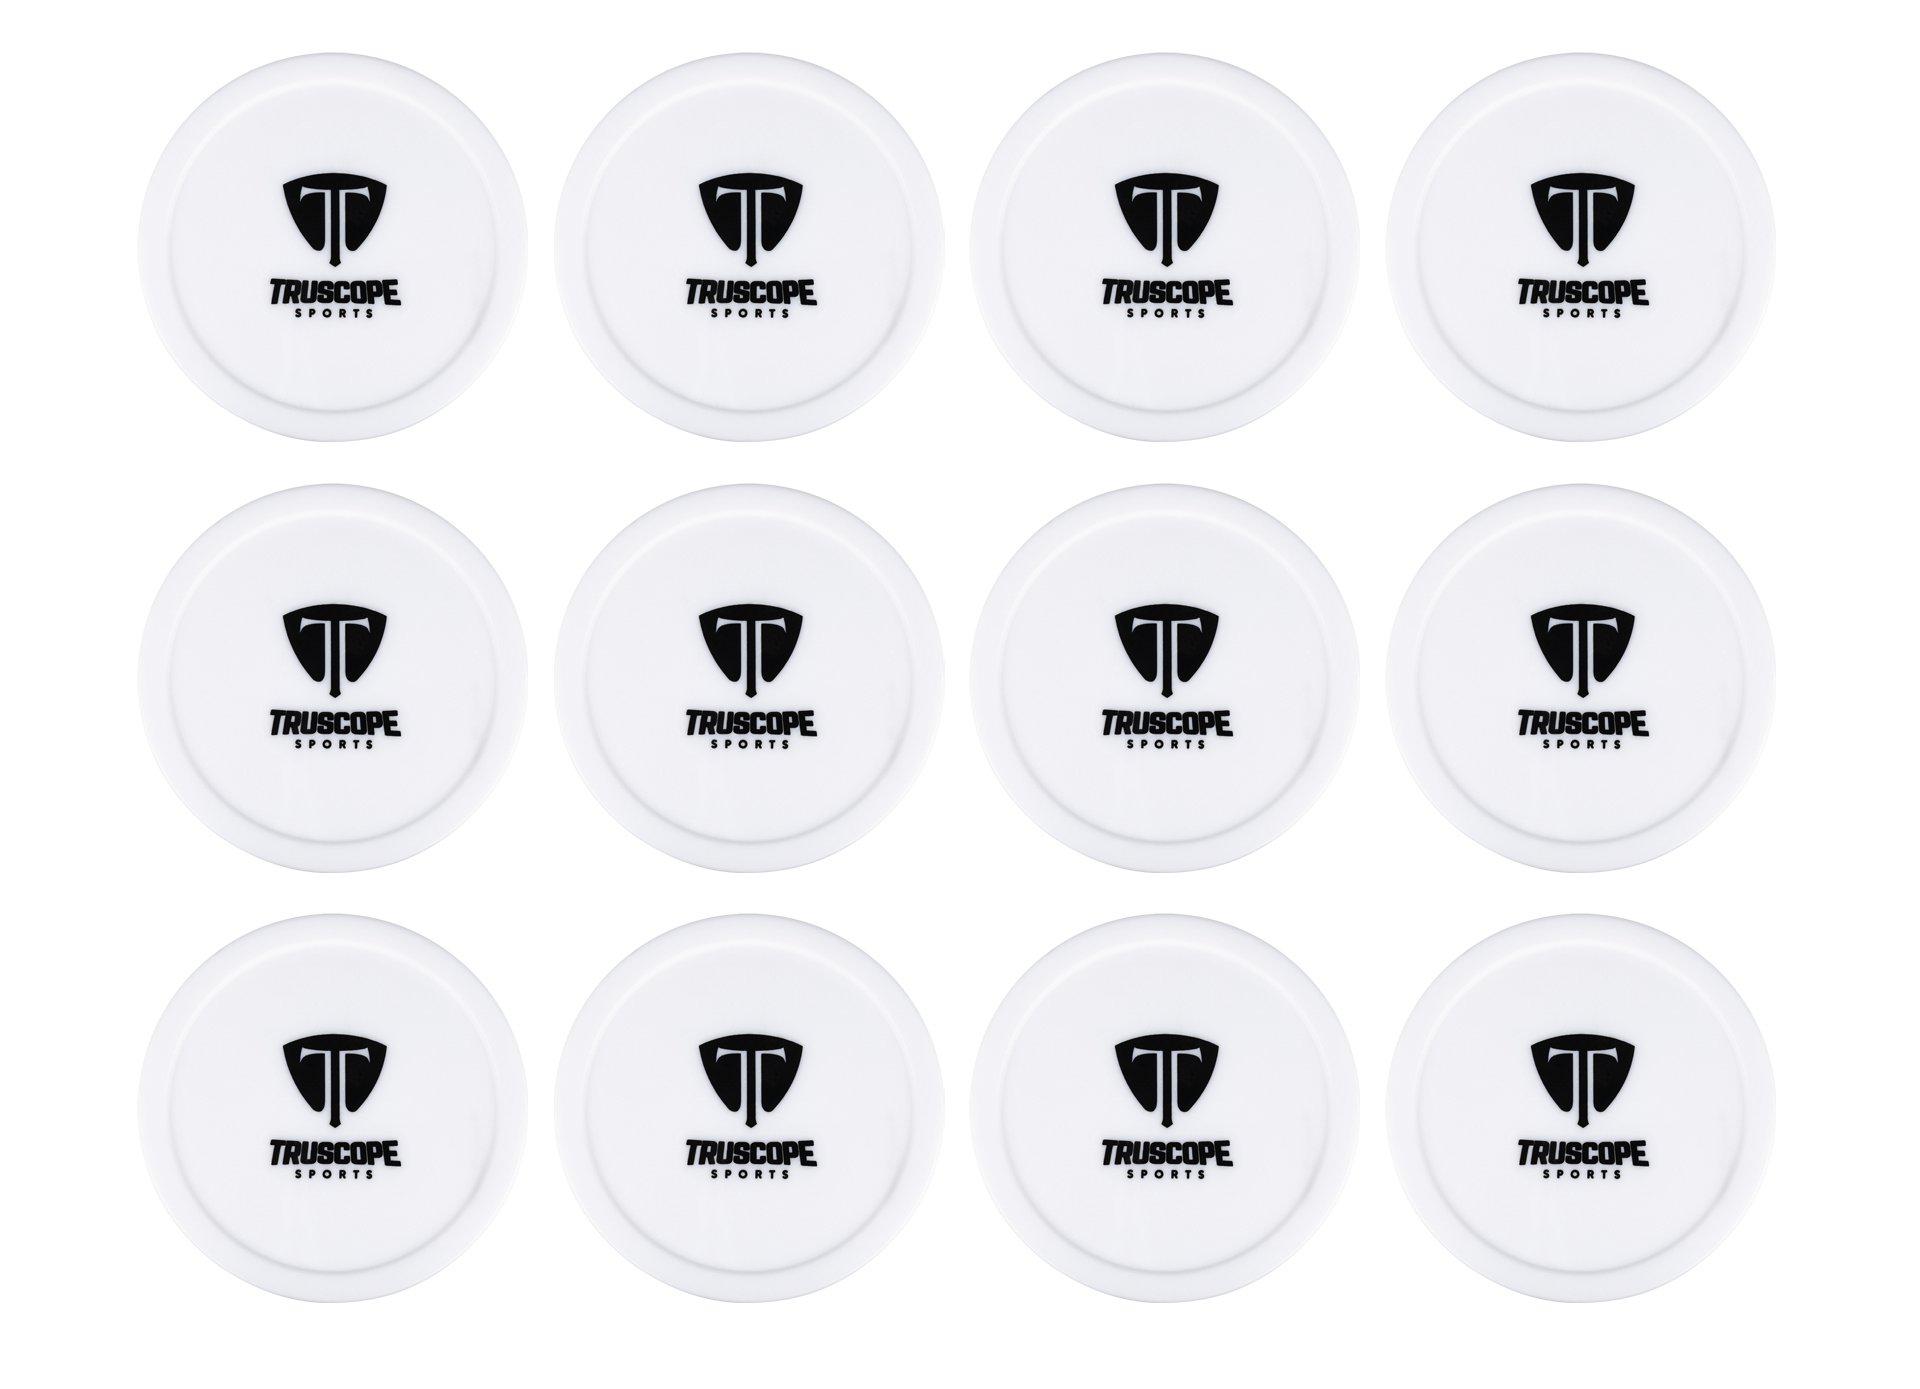 Truscope Sports 12 Pack 3 1/4 Inch Air Hockey Pucks (White)